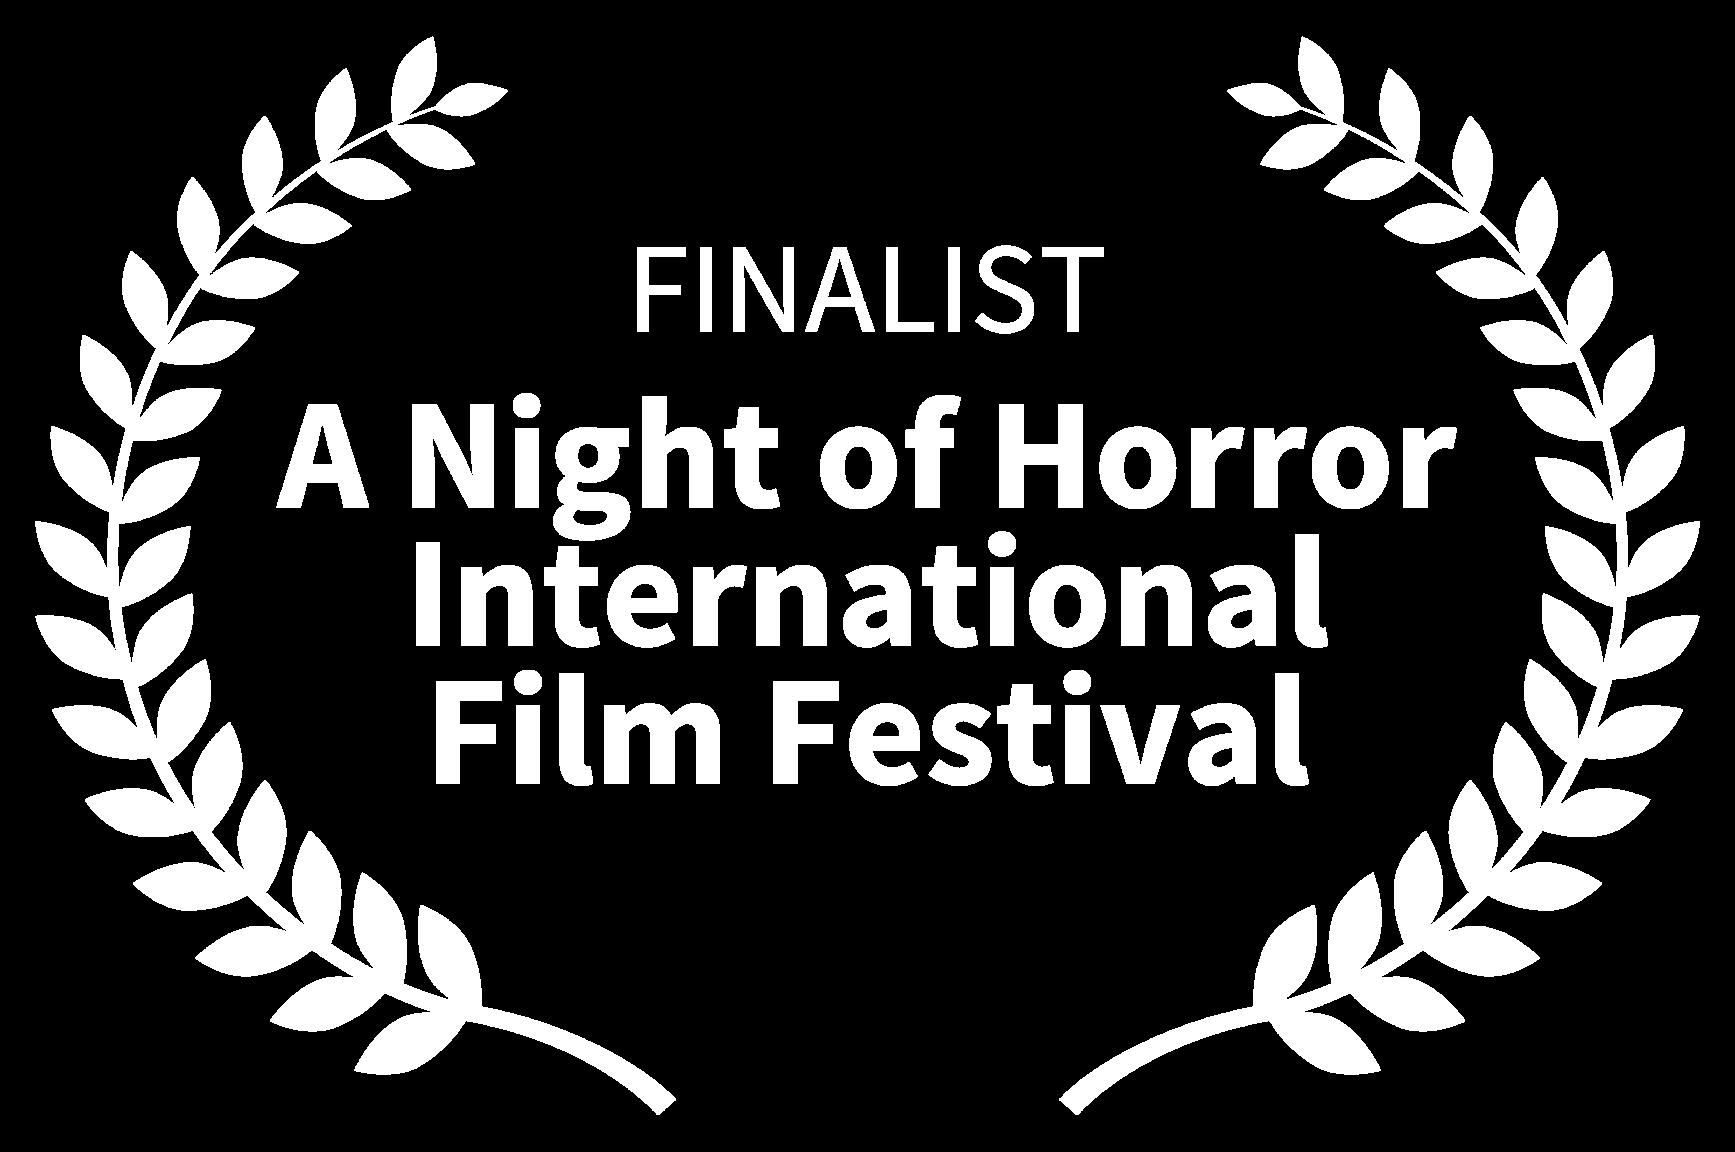 FINALIST - A Night of Horror International Film Festival